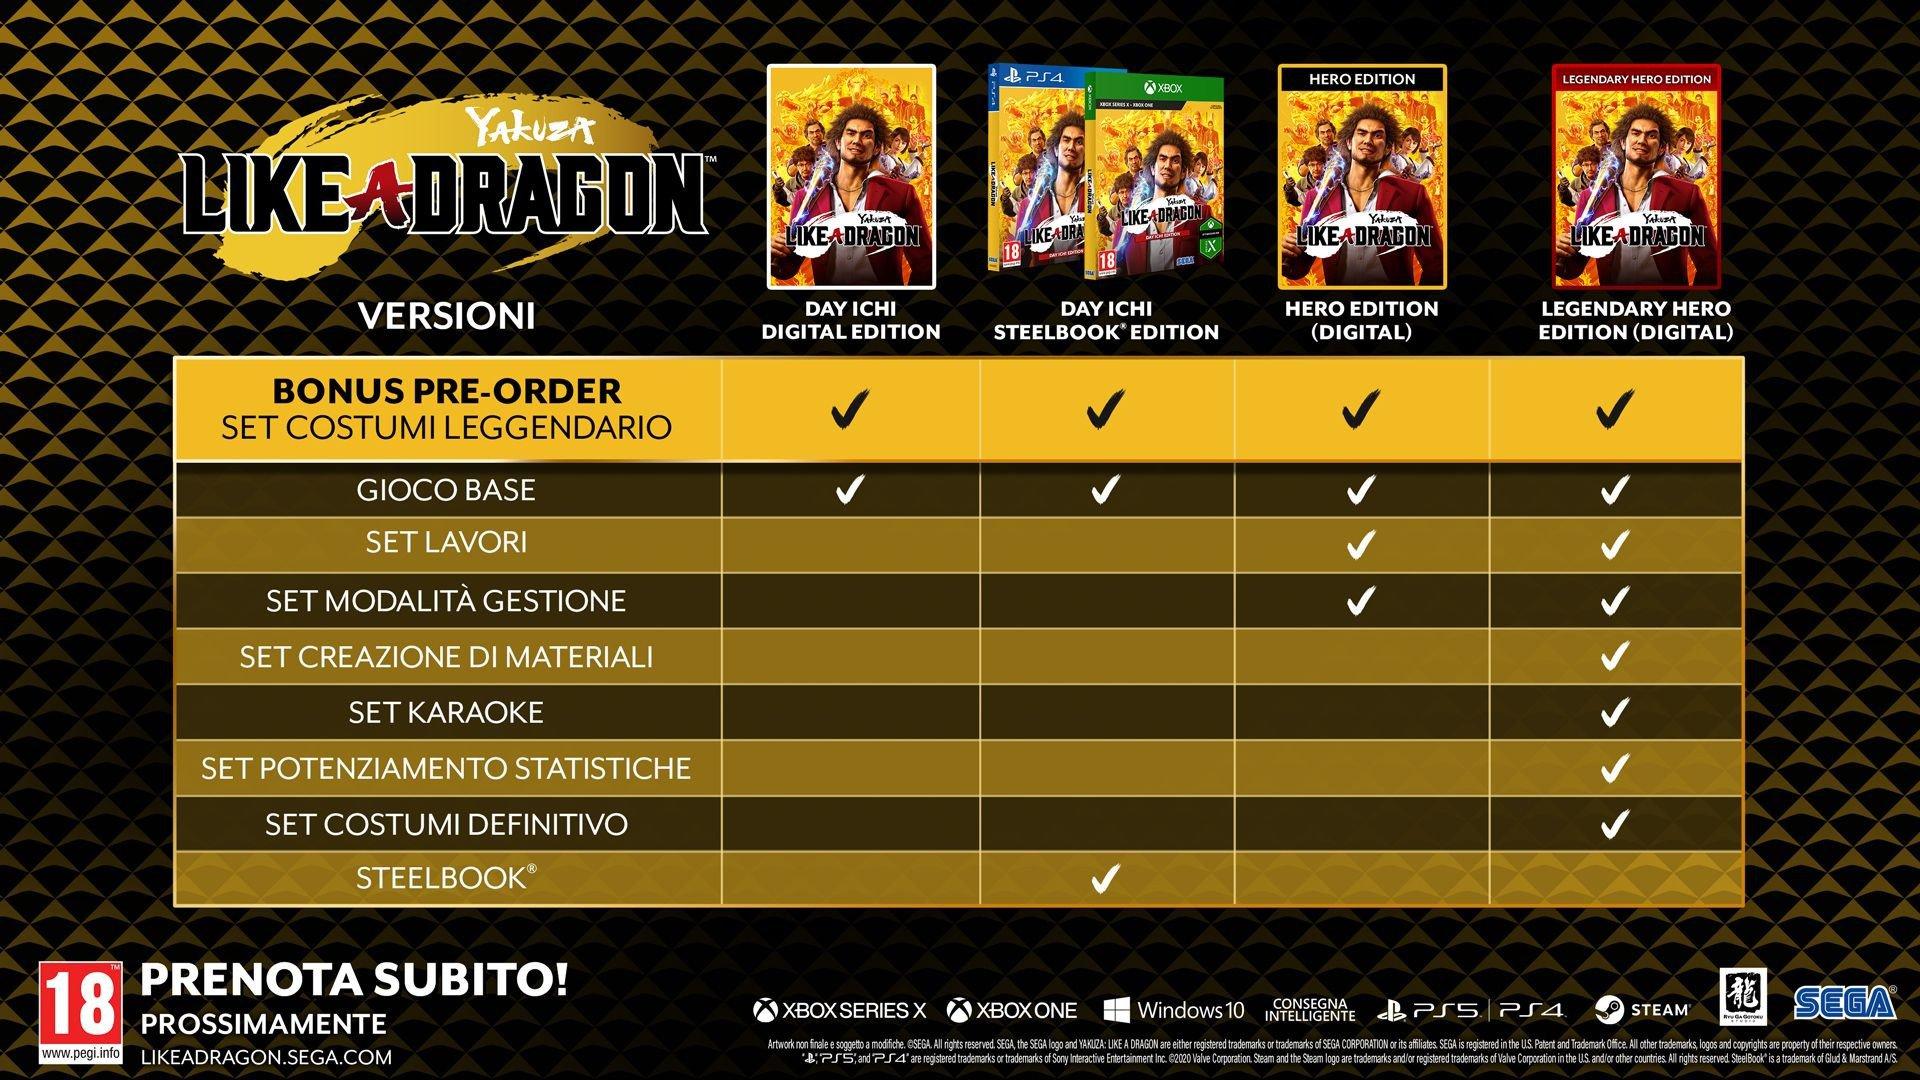 yakuza-like-dragon-v1-647397.jpg